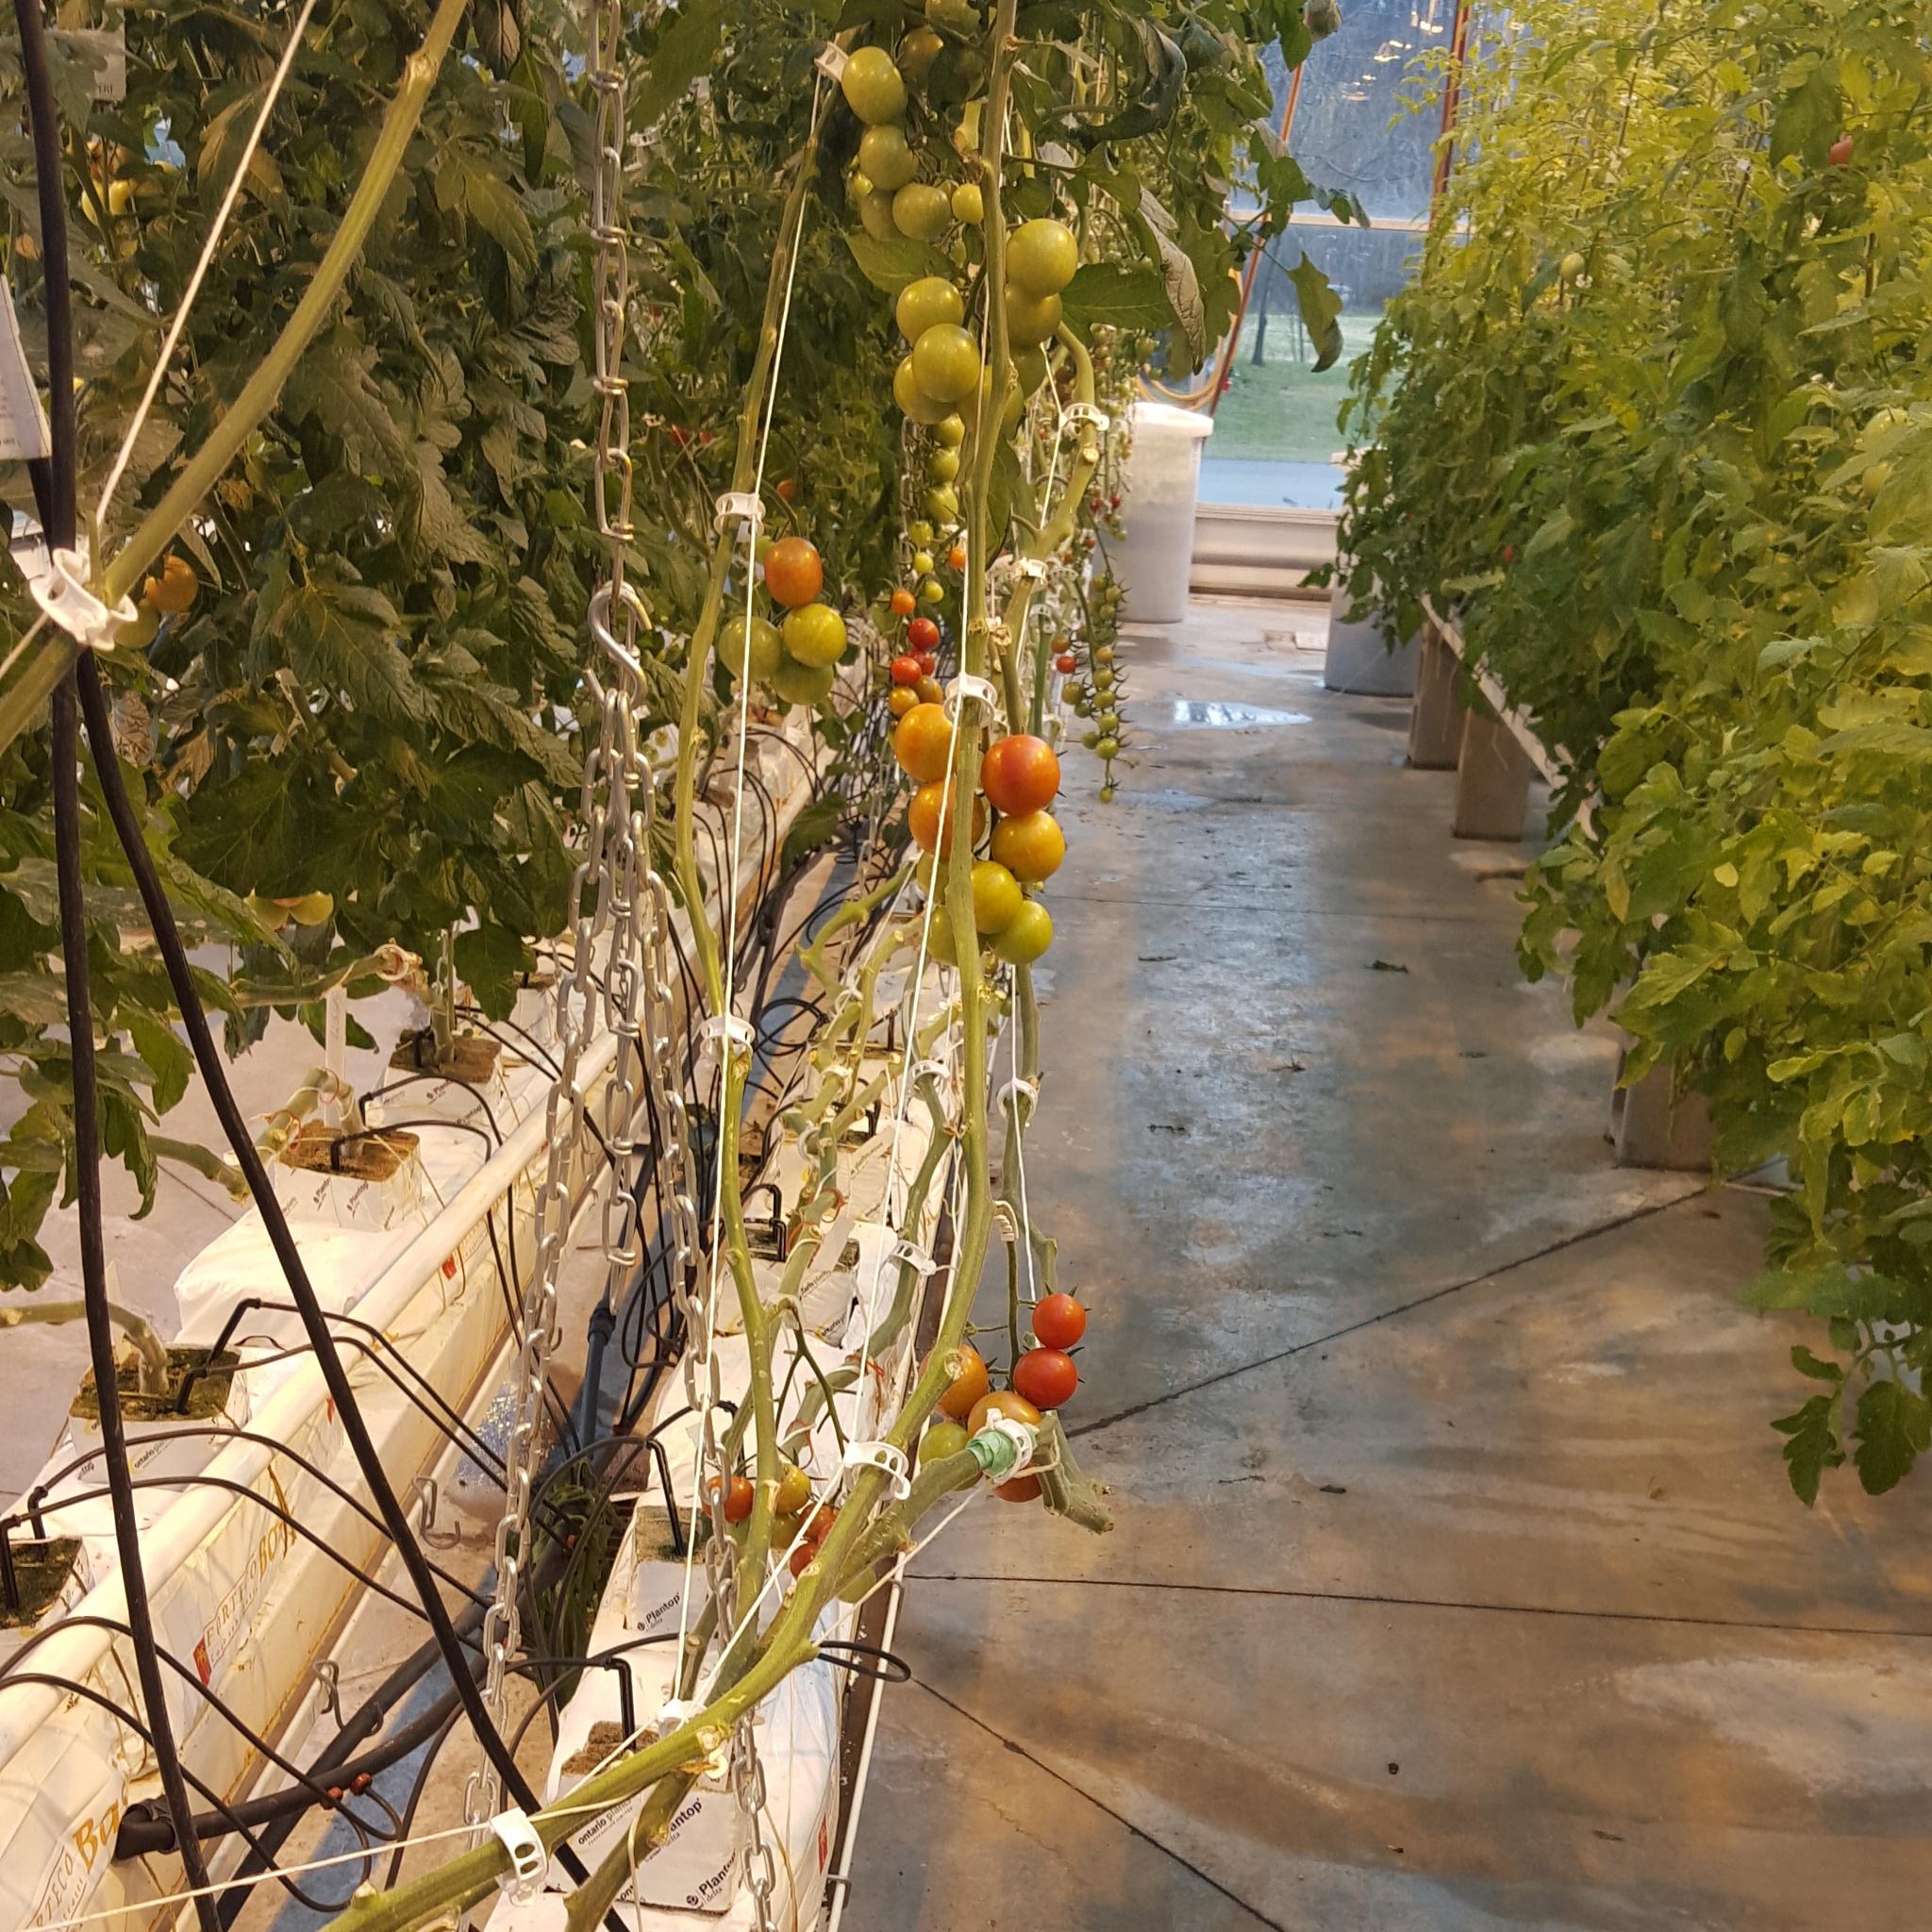 tomatoes by RegSoper